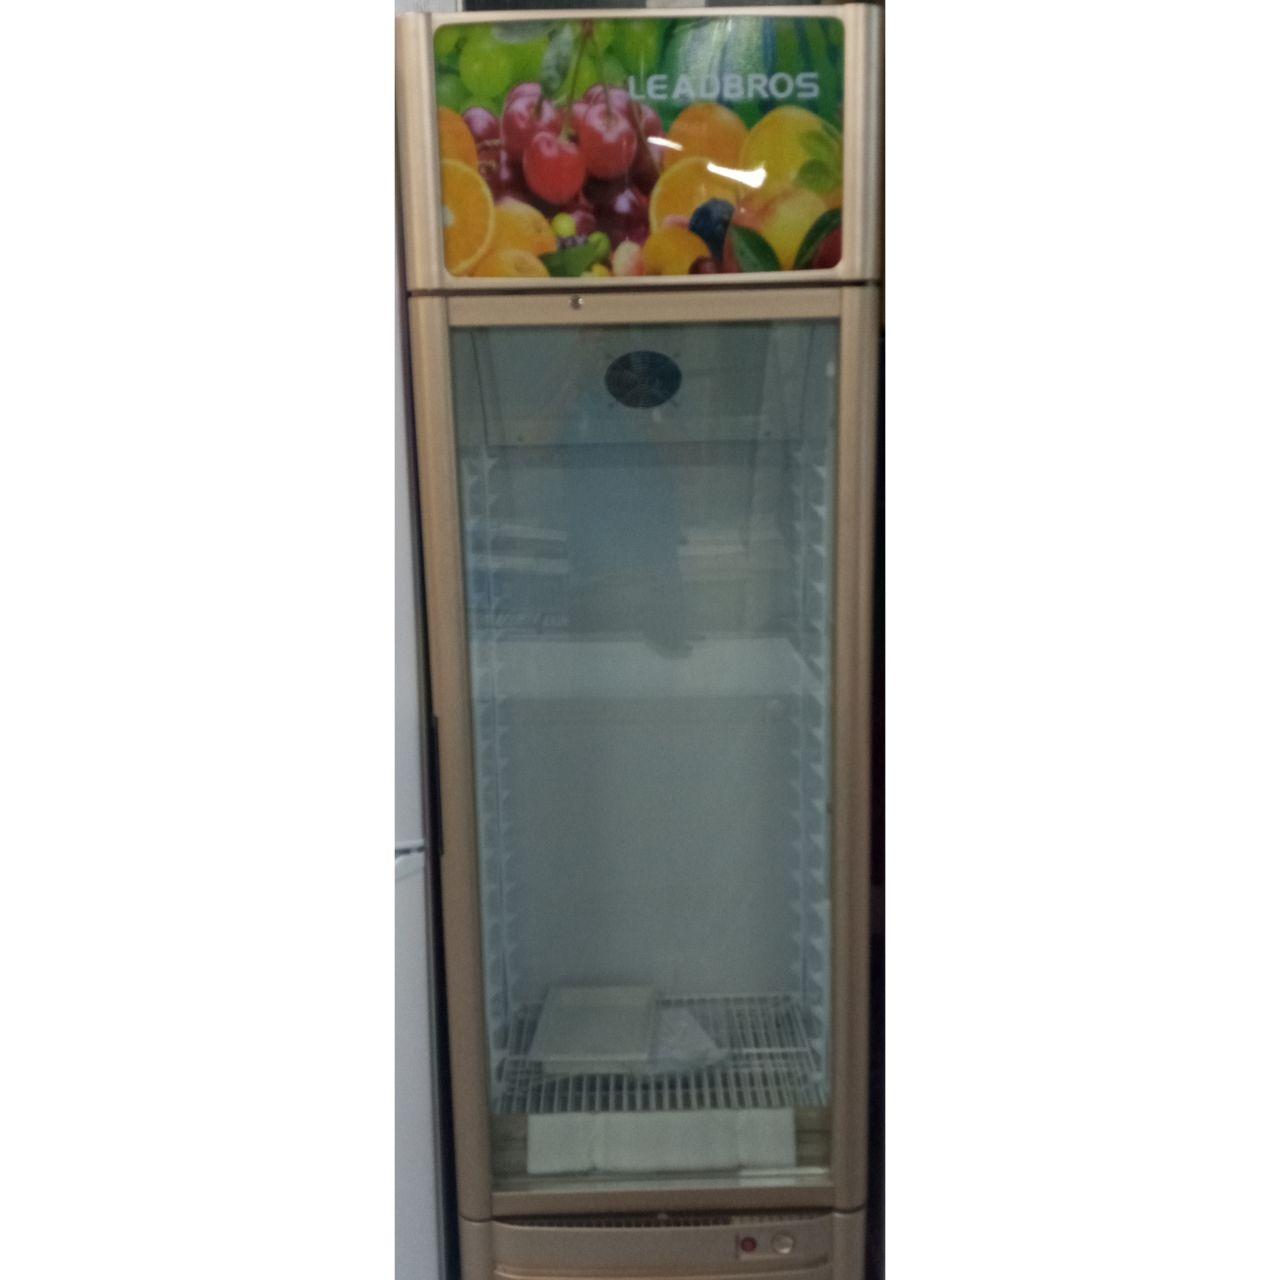 Холодильник витринный Leadbros 400 литров